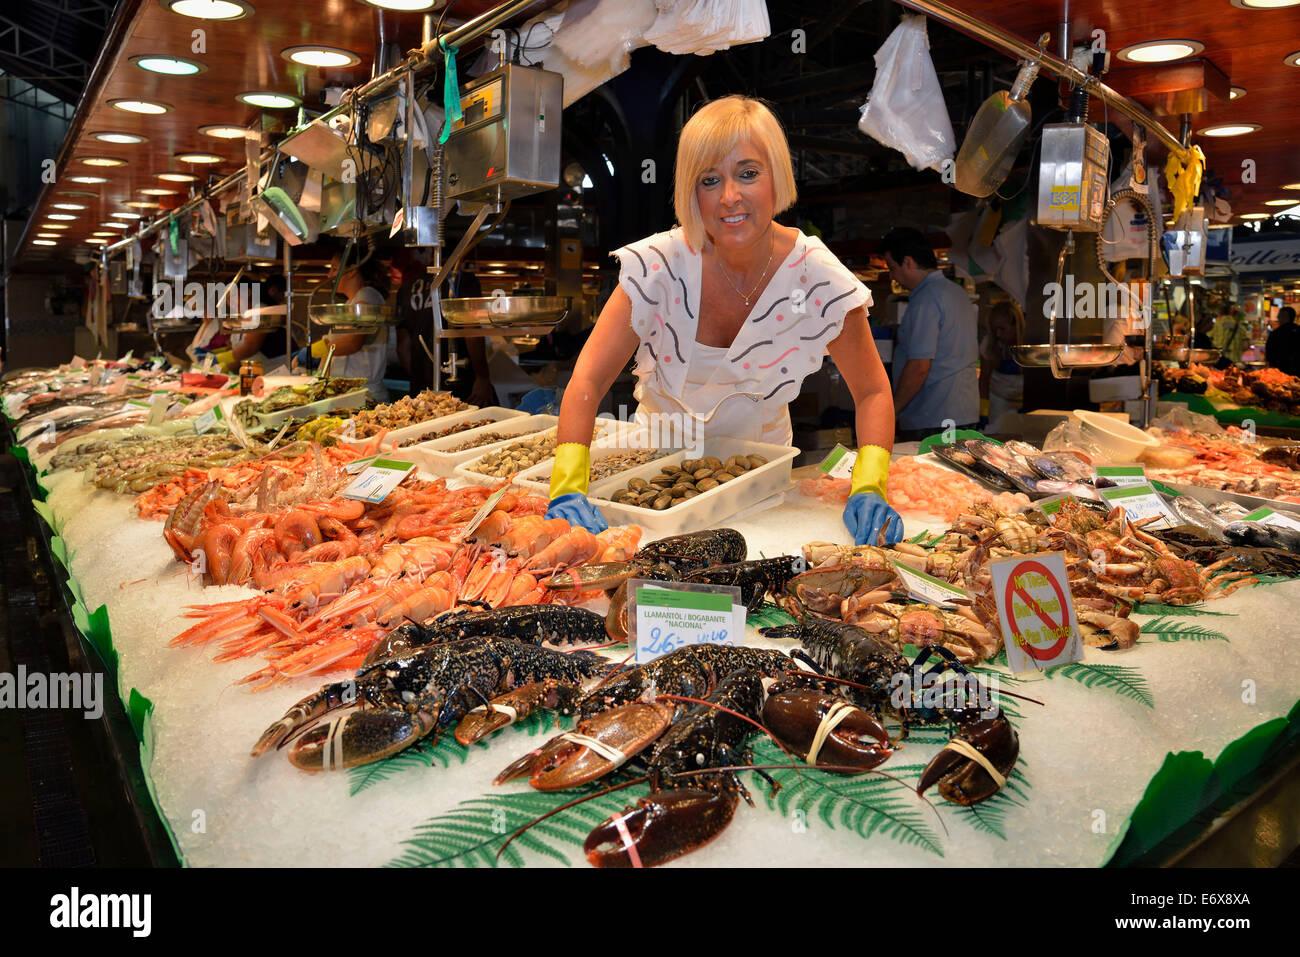 Fishmonger at her stall in the market hall, Mercat de la Boquería, also Mercat de Sant Josep, Barcelona, Catalonia, Stock Photo